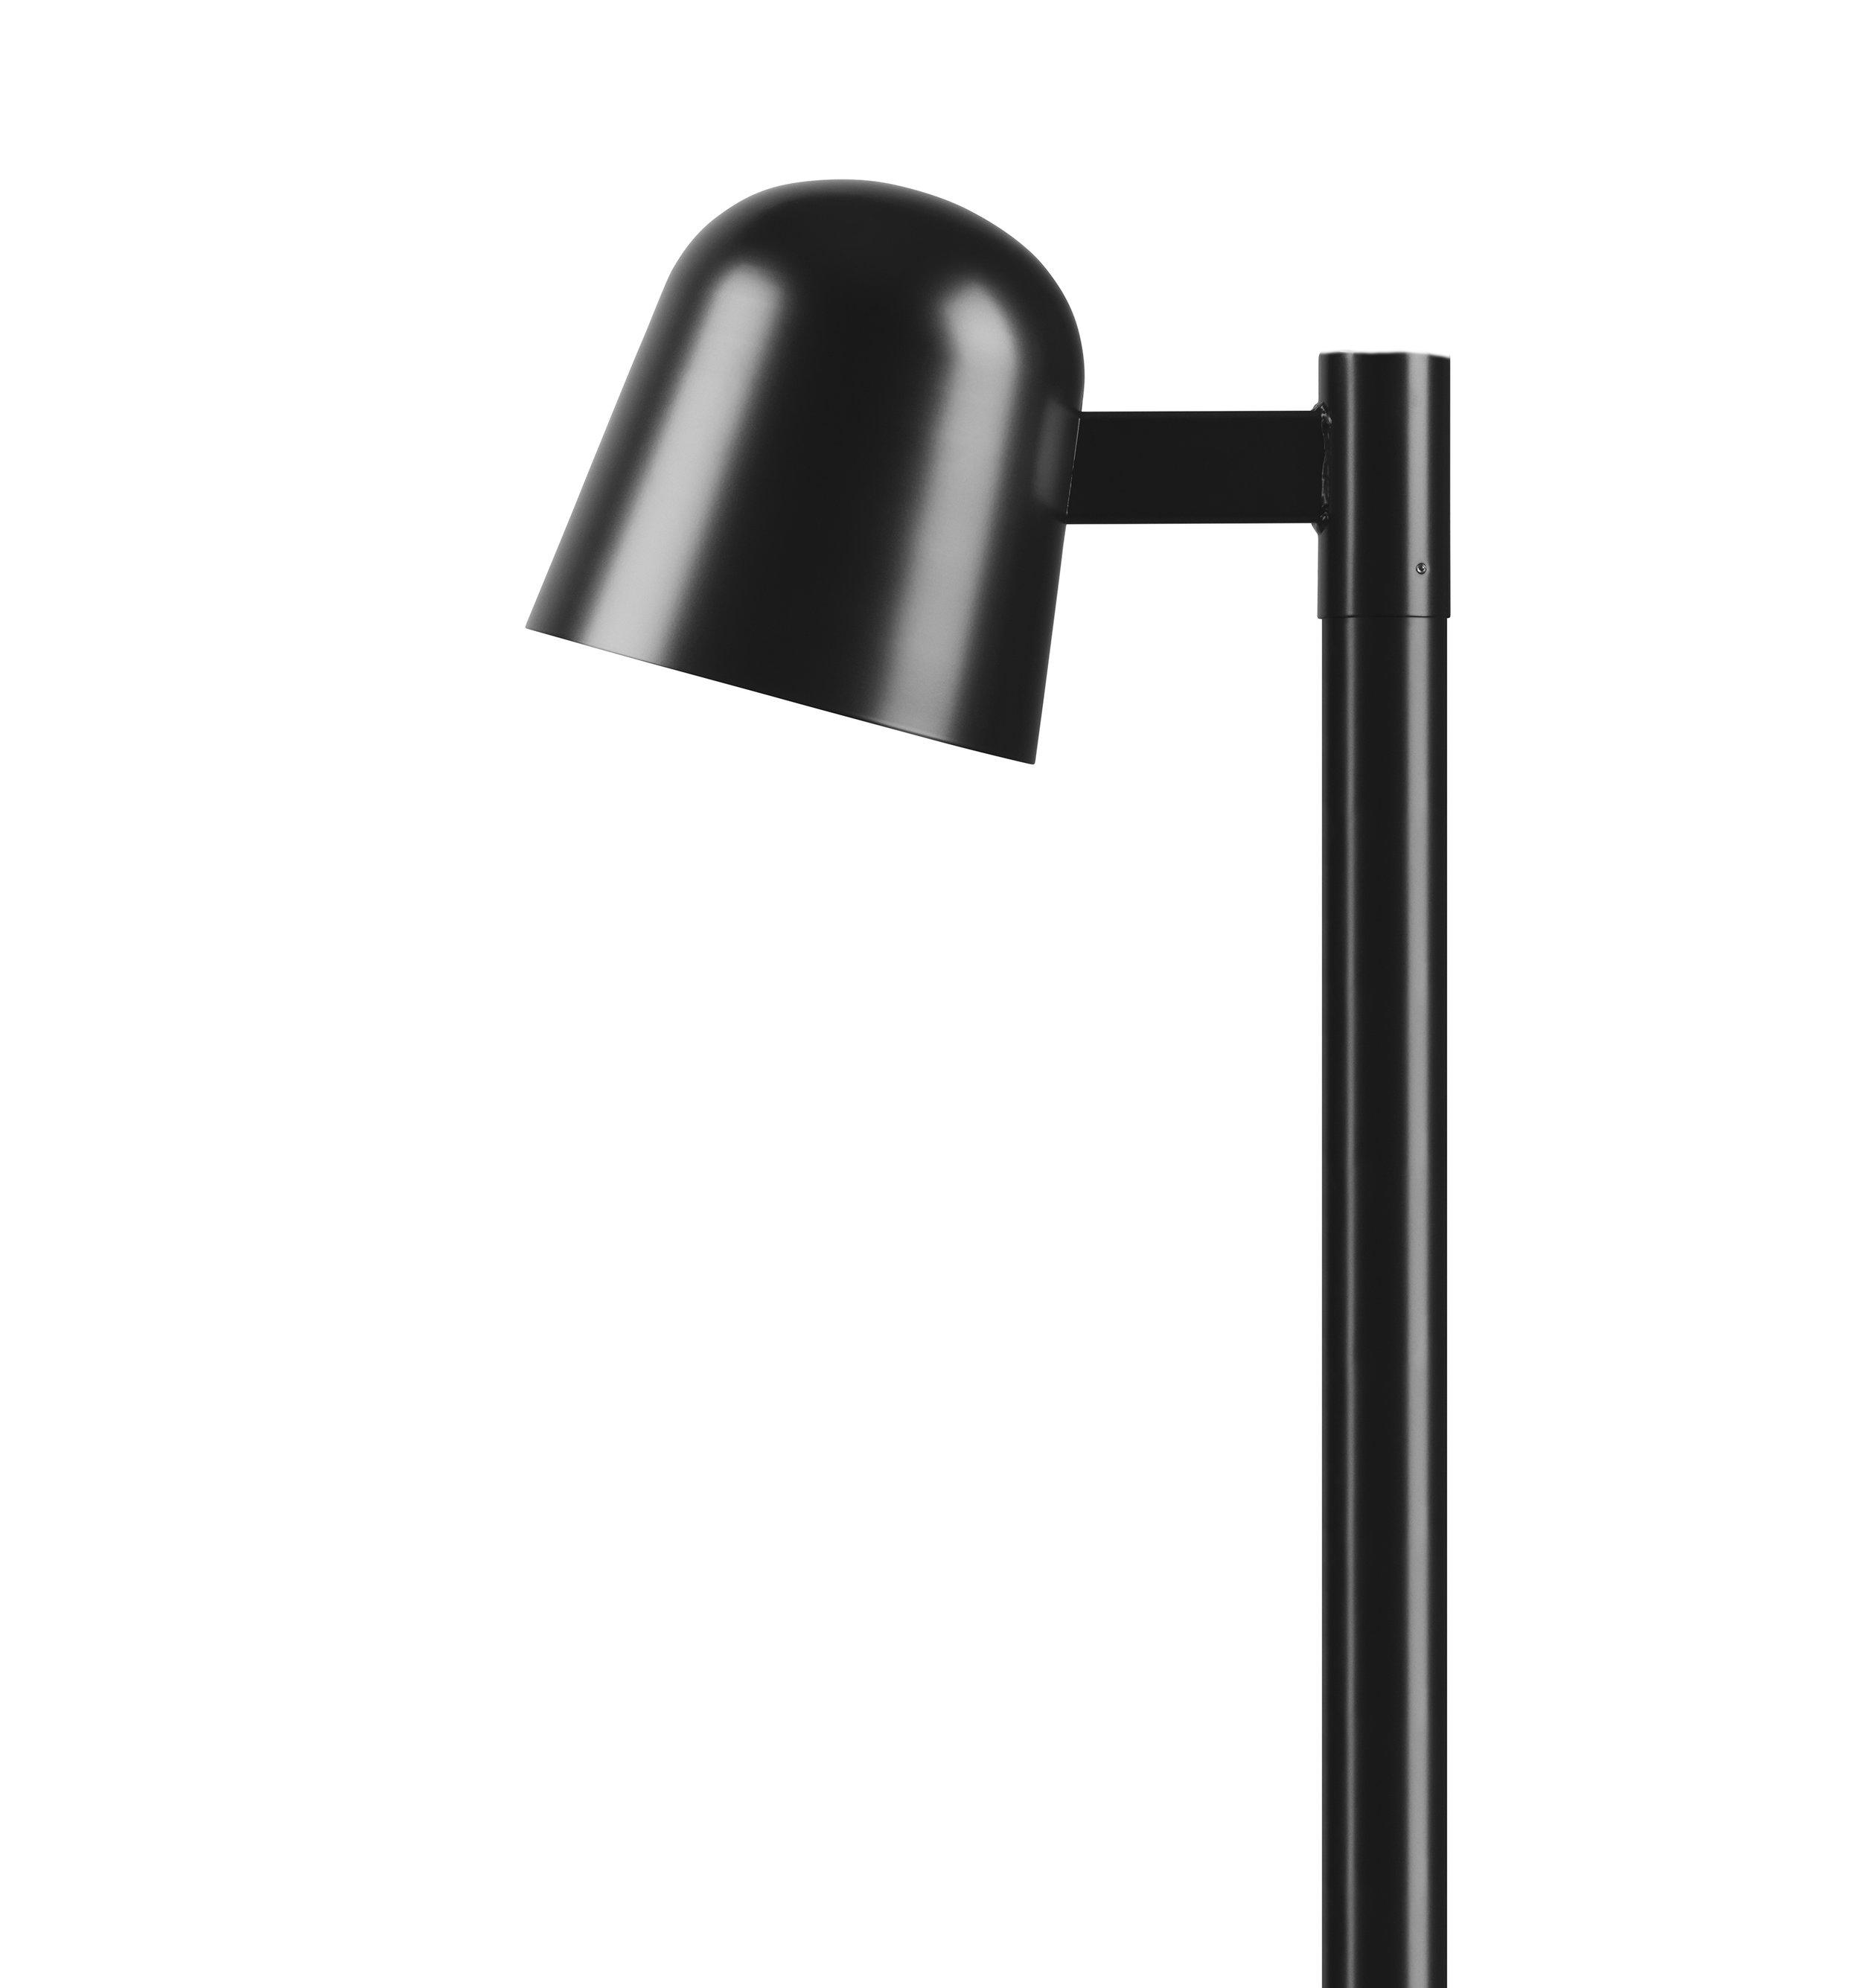 CONVEX-pole-black.jpg